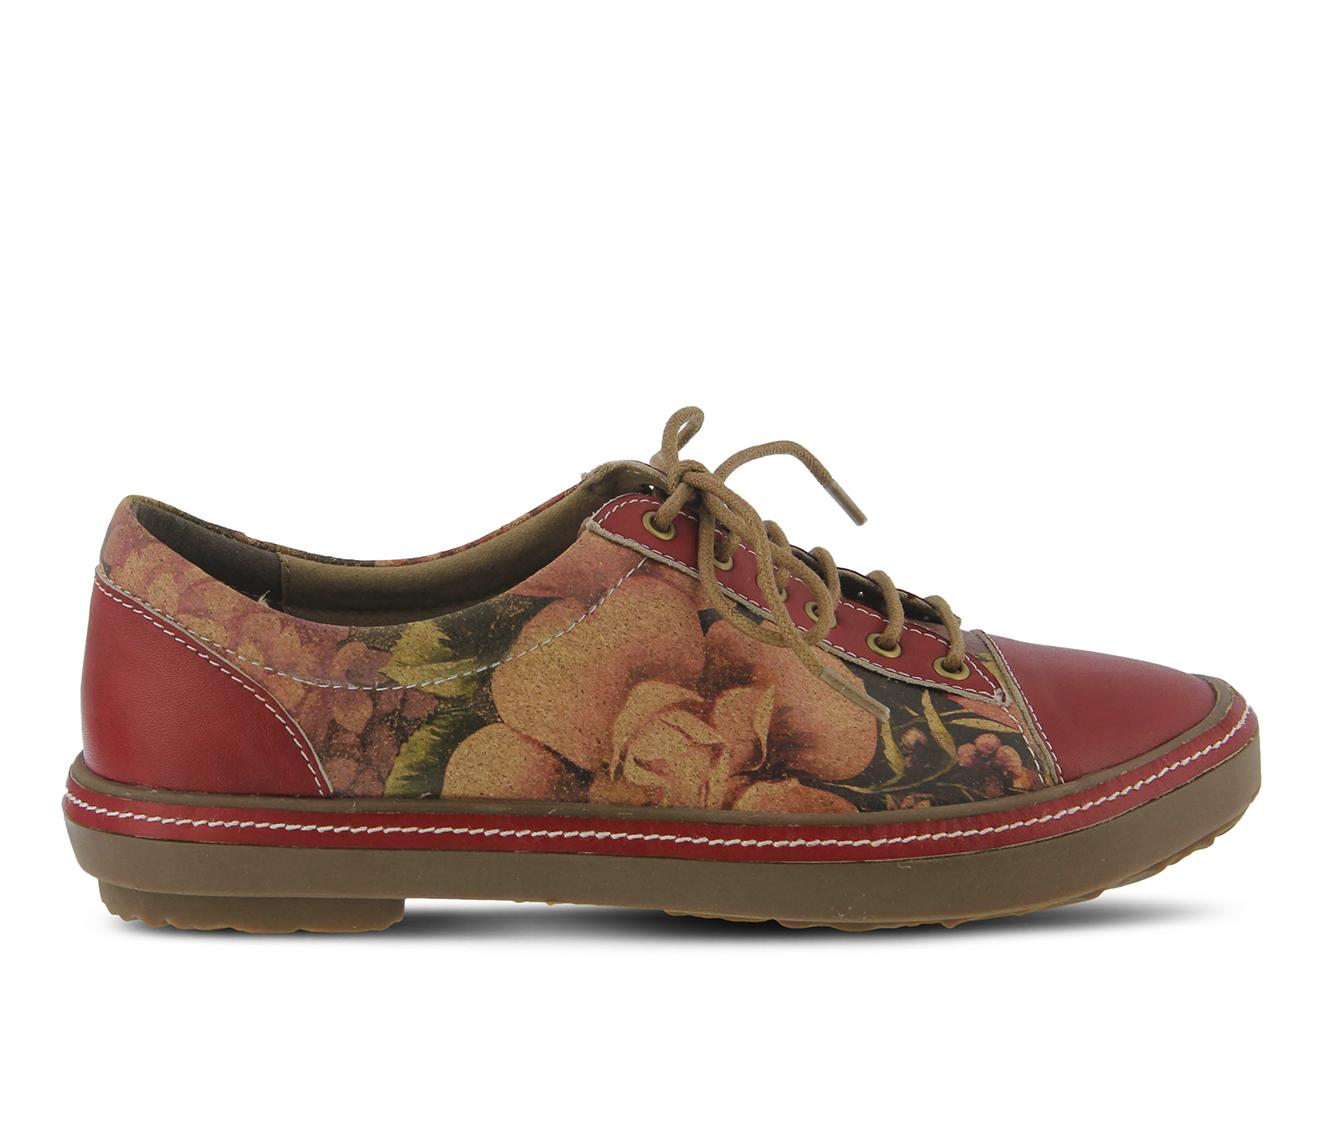 L'Artiste Libbi-Rose Women's Shoe (Red Leather)